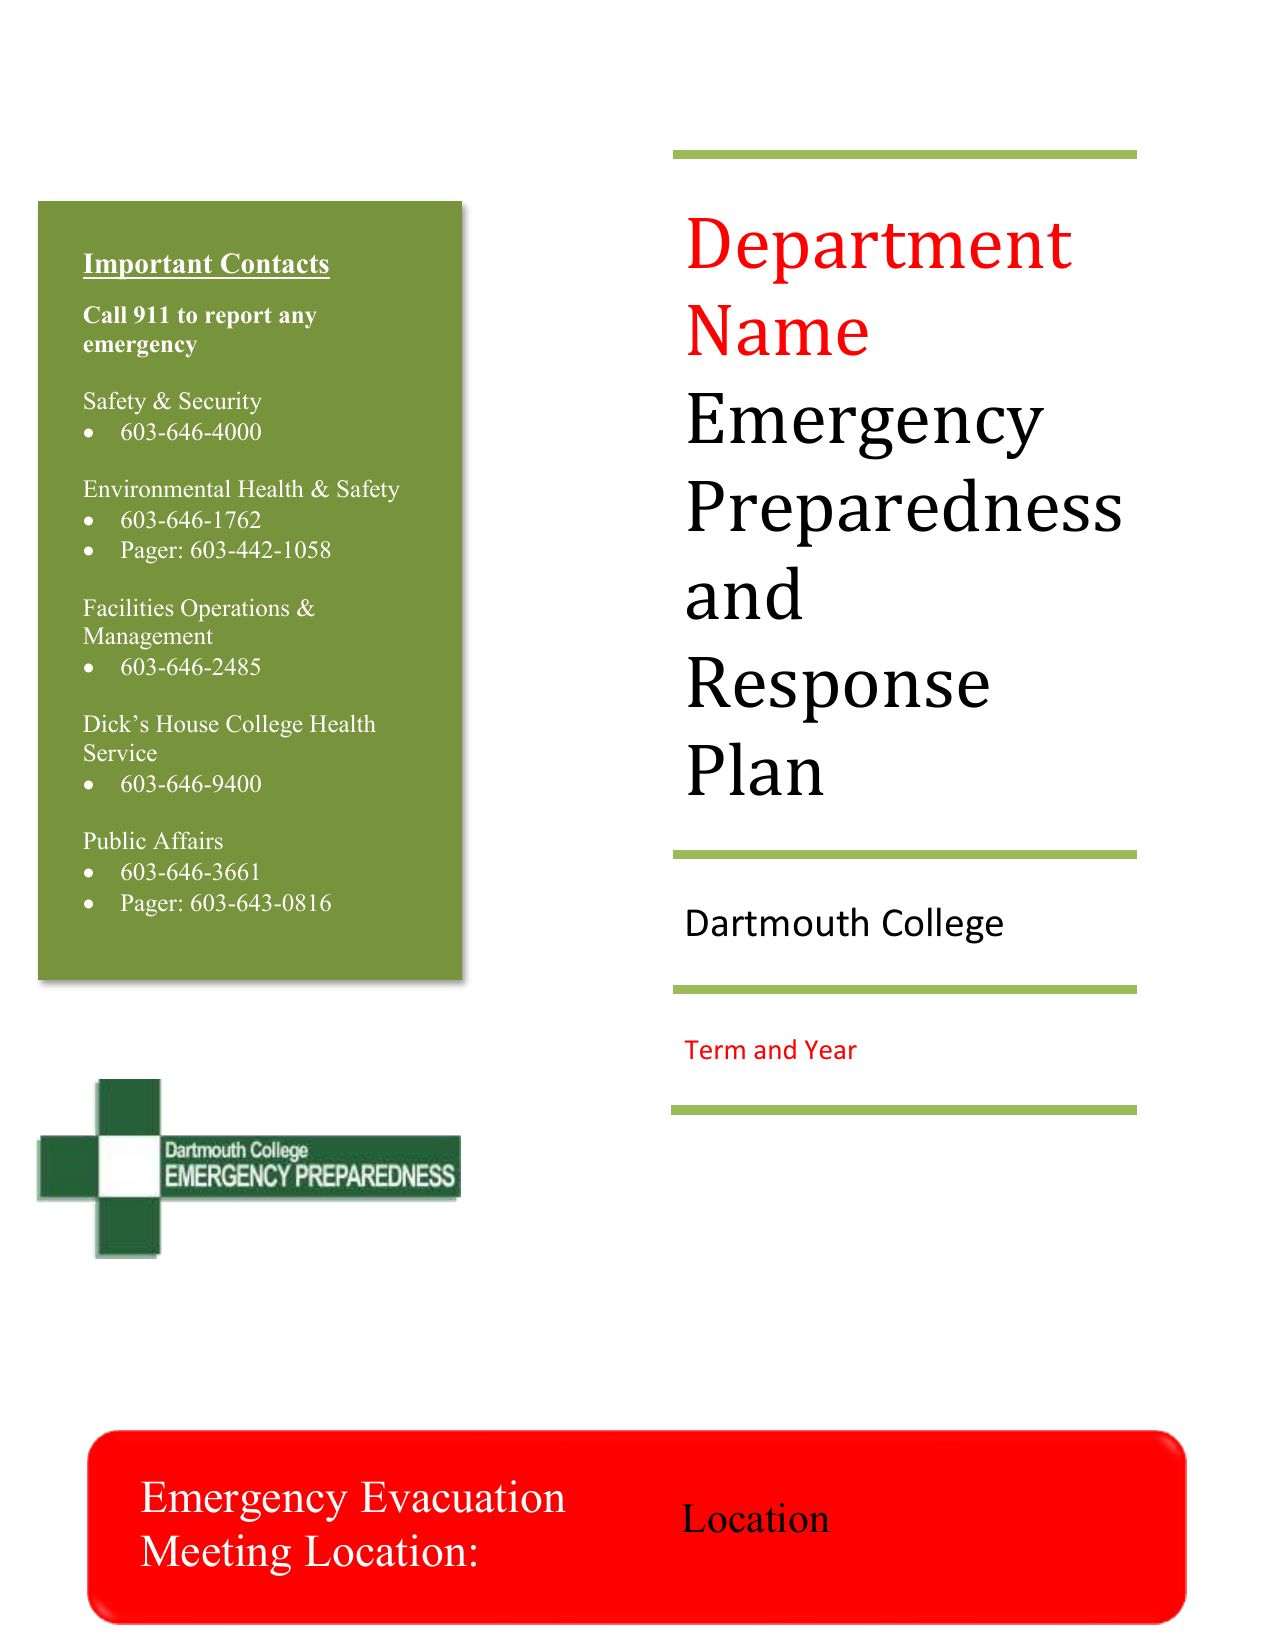 Emergency Preparedness and Response Plan